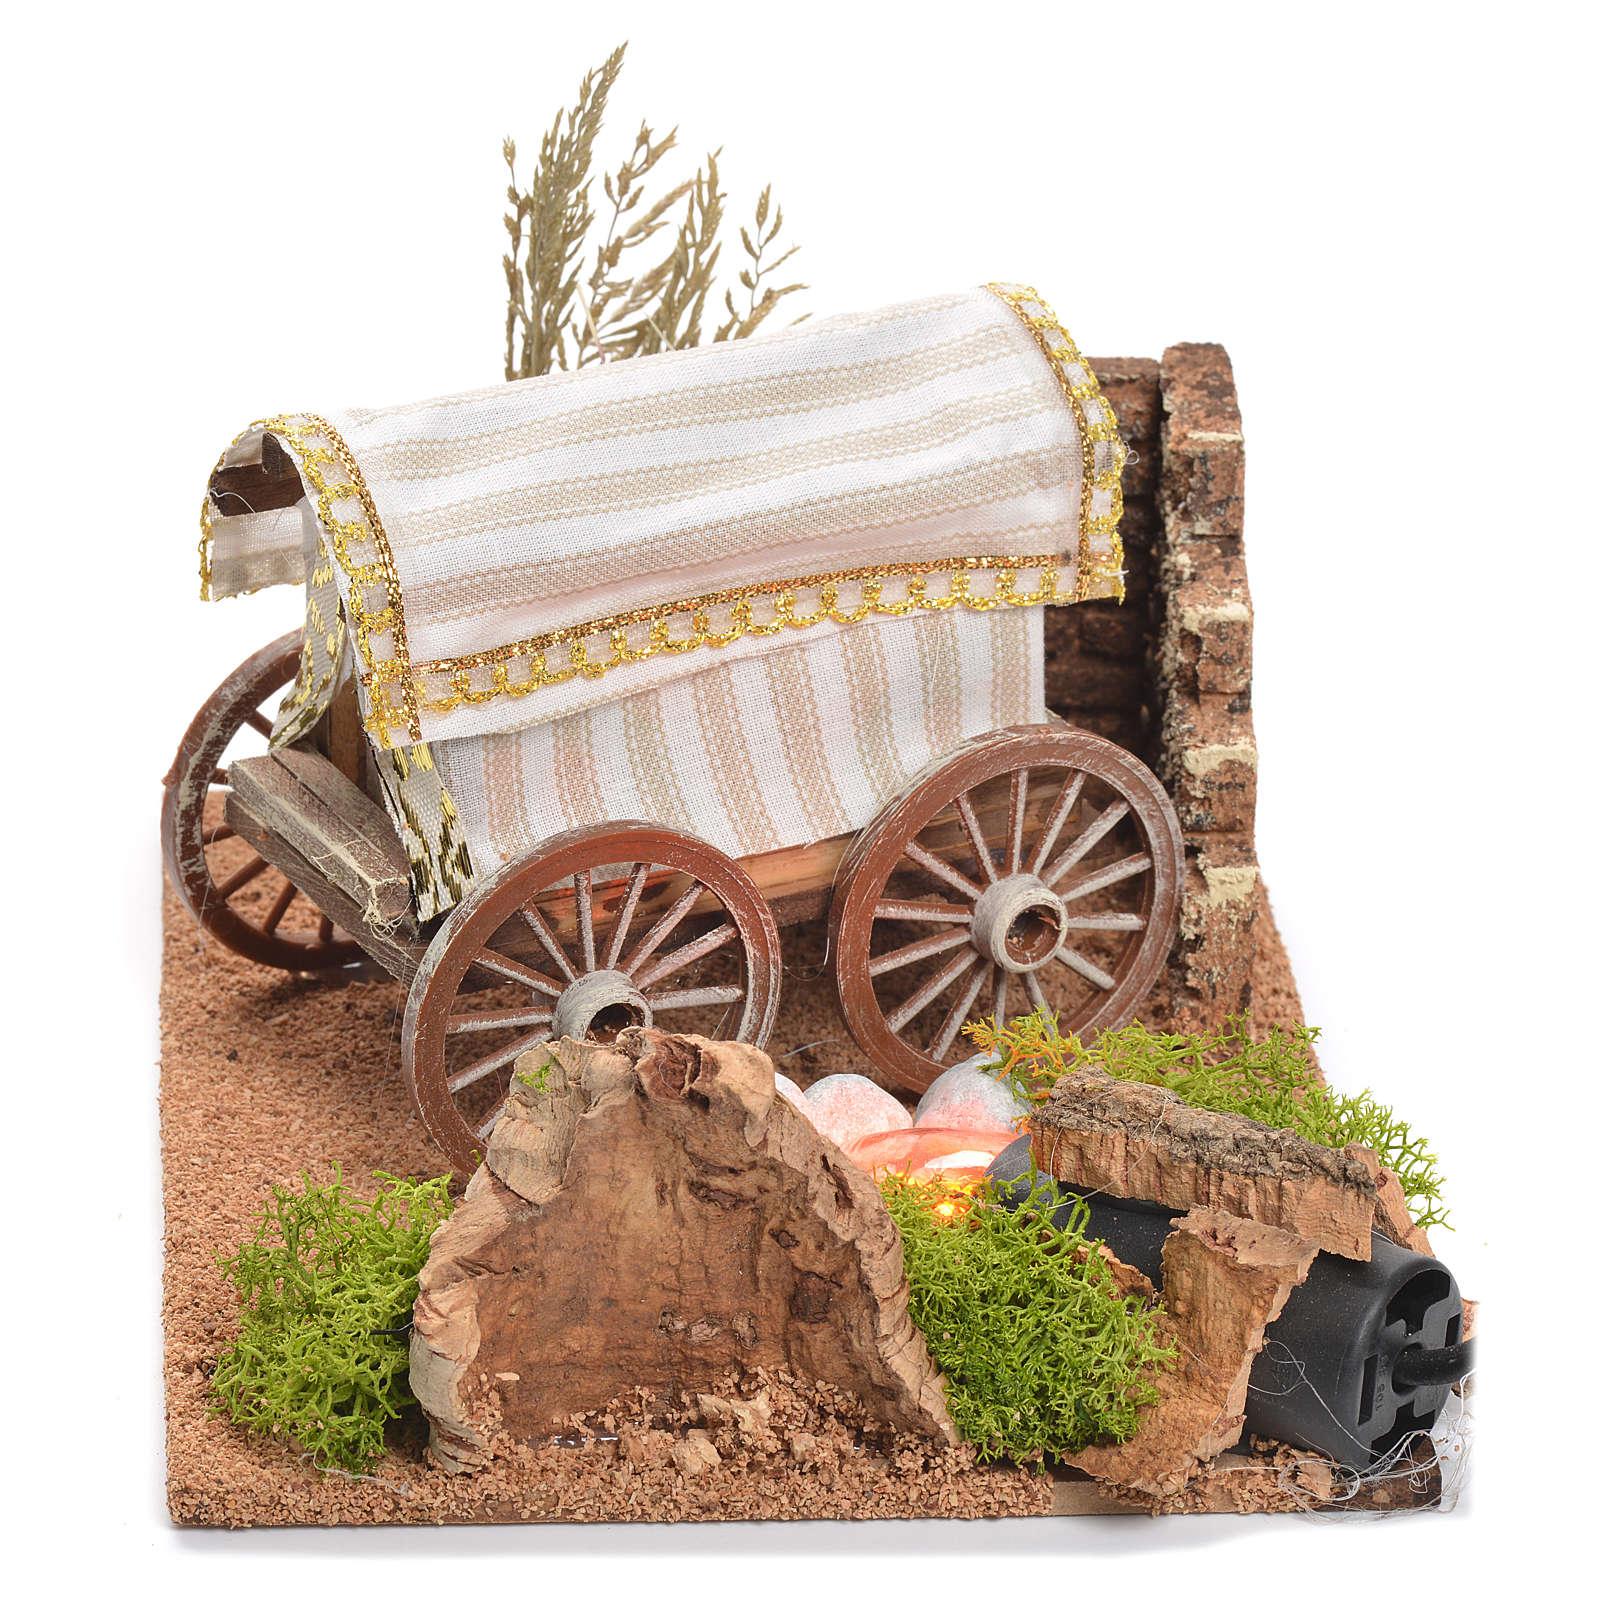 Caravana belén con fuego 22x26x40 cm 4